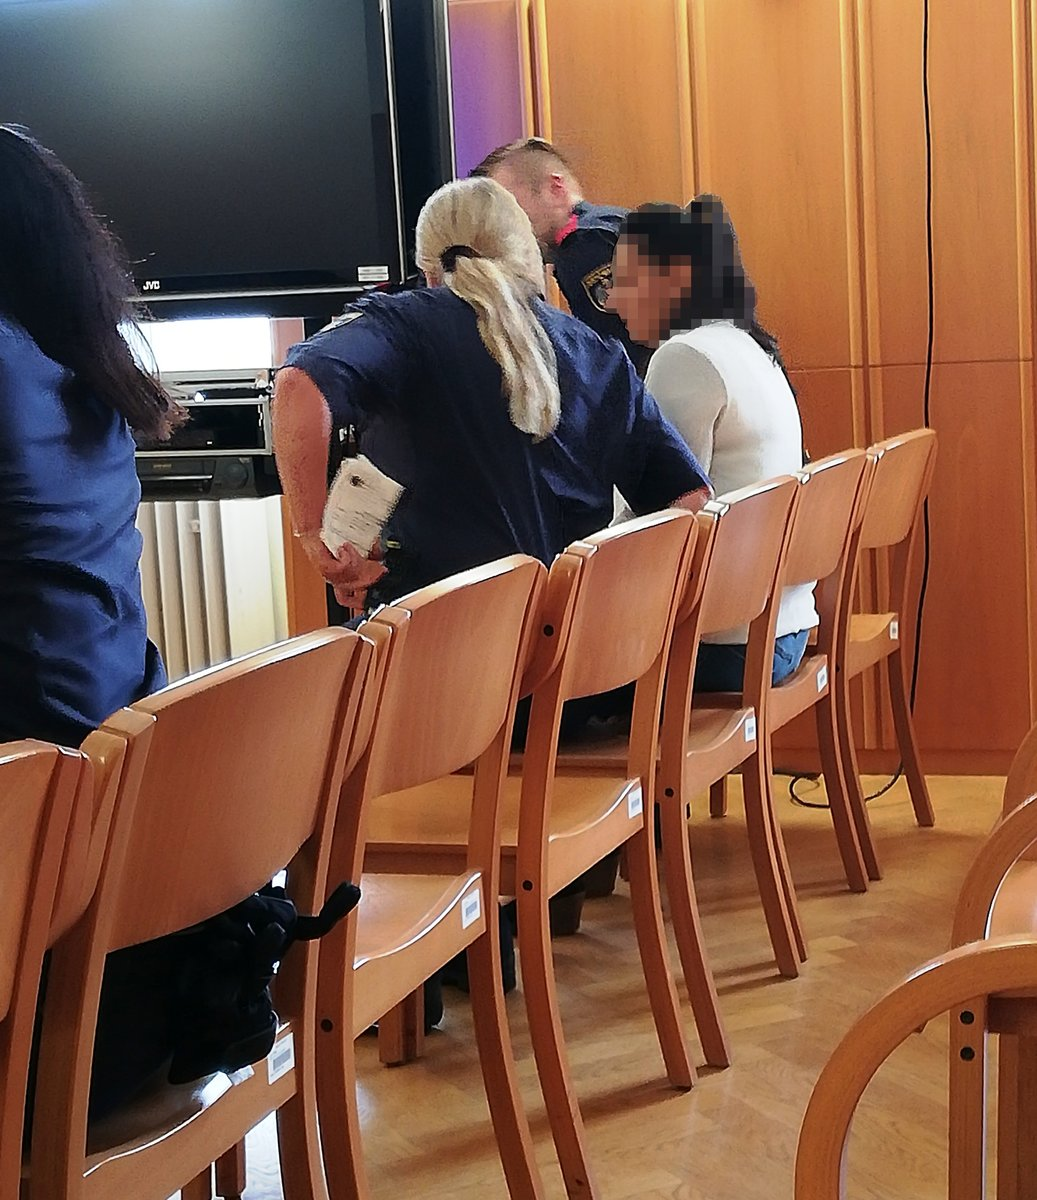 Oberau neue bekanntschaften, Trofaiach slow dating